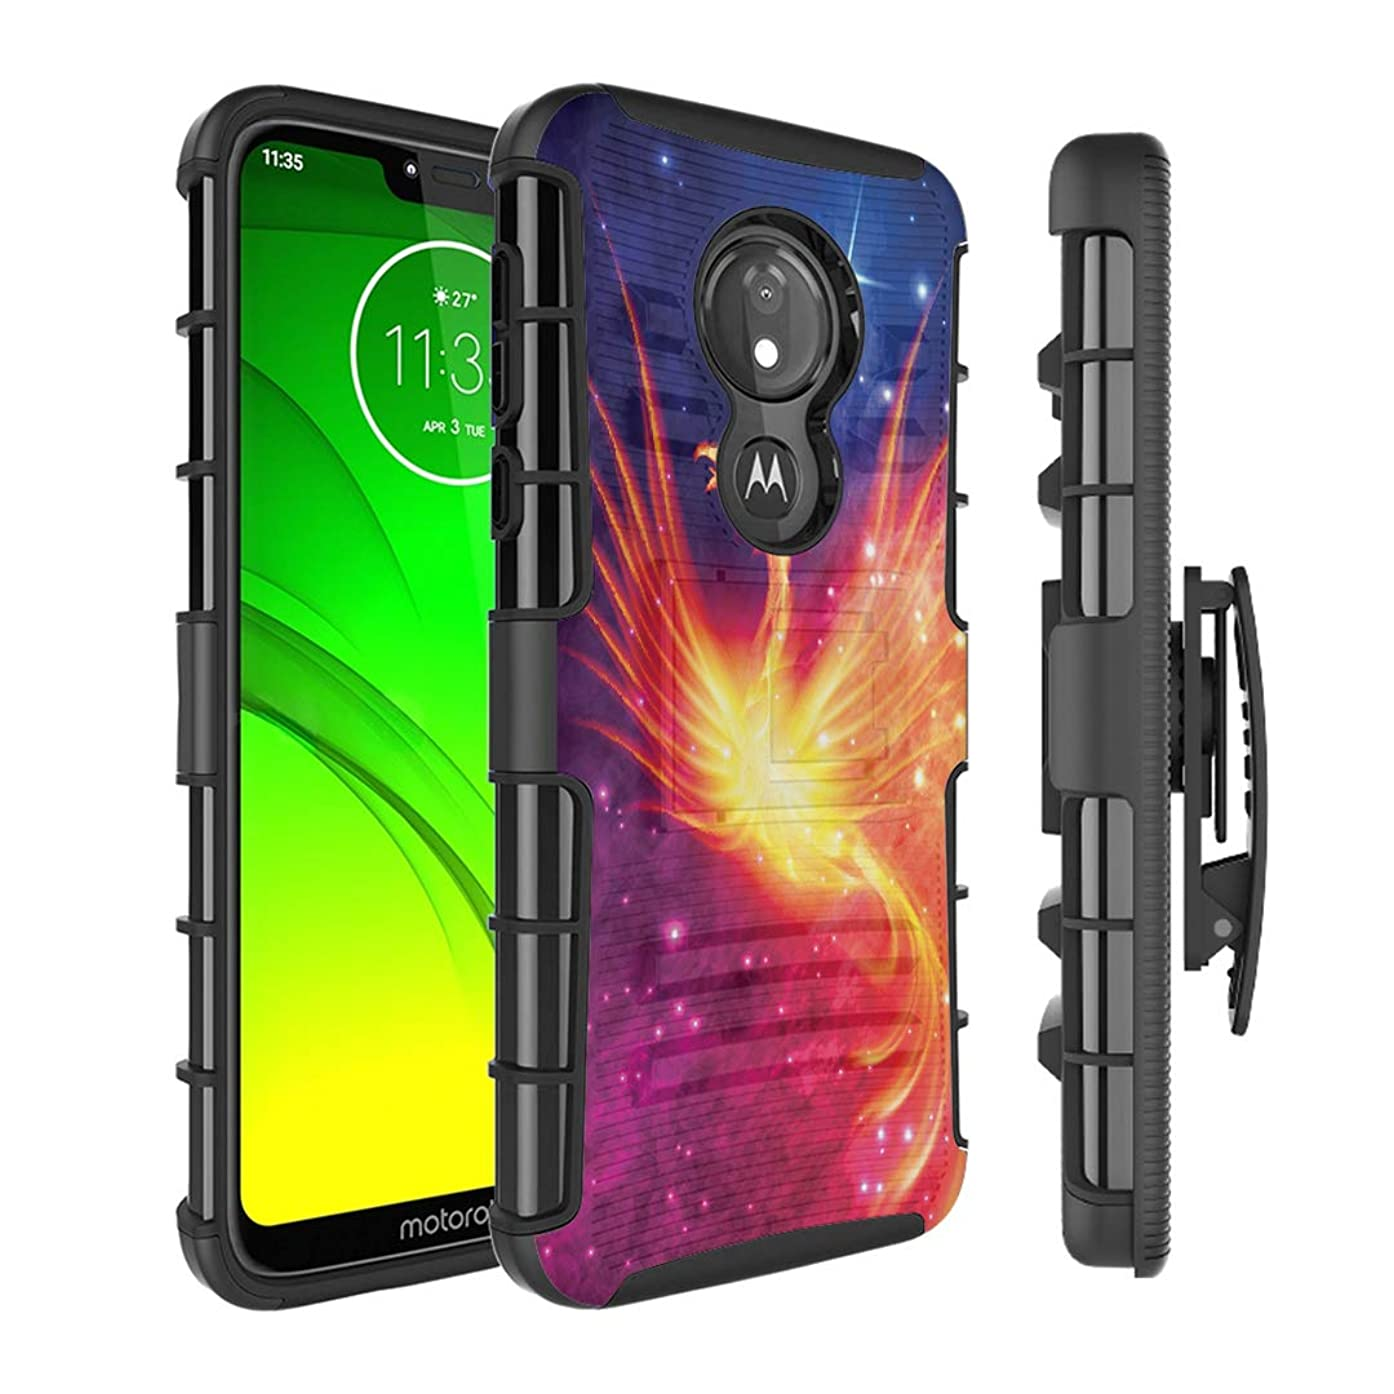 Moriko Case Compatible with Moto G7 Power, Moto G7 Supra [Kickstand Holster Combo Heavy Duty Protection Case Black] for Motorola Moto G7 Power - (Fire Phoenix)